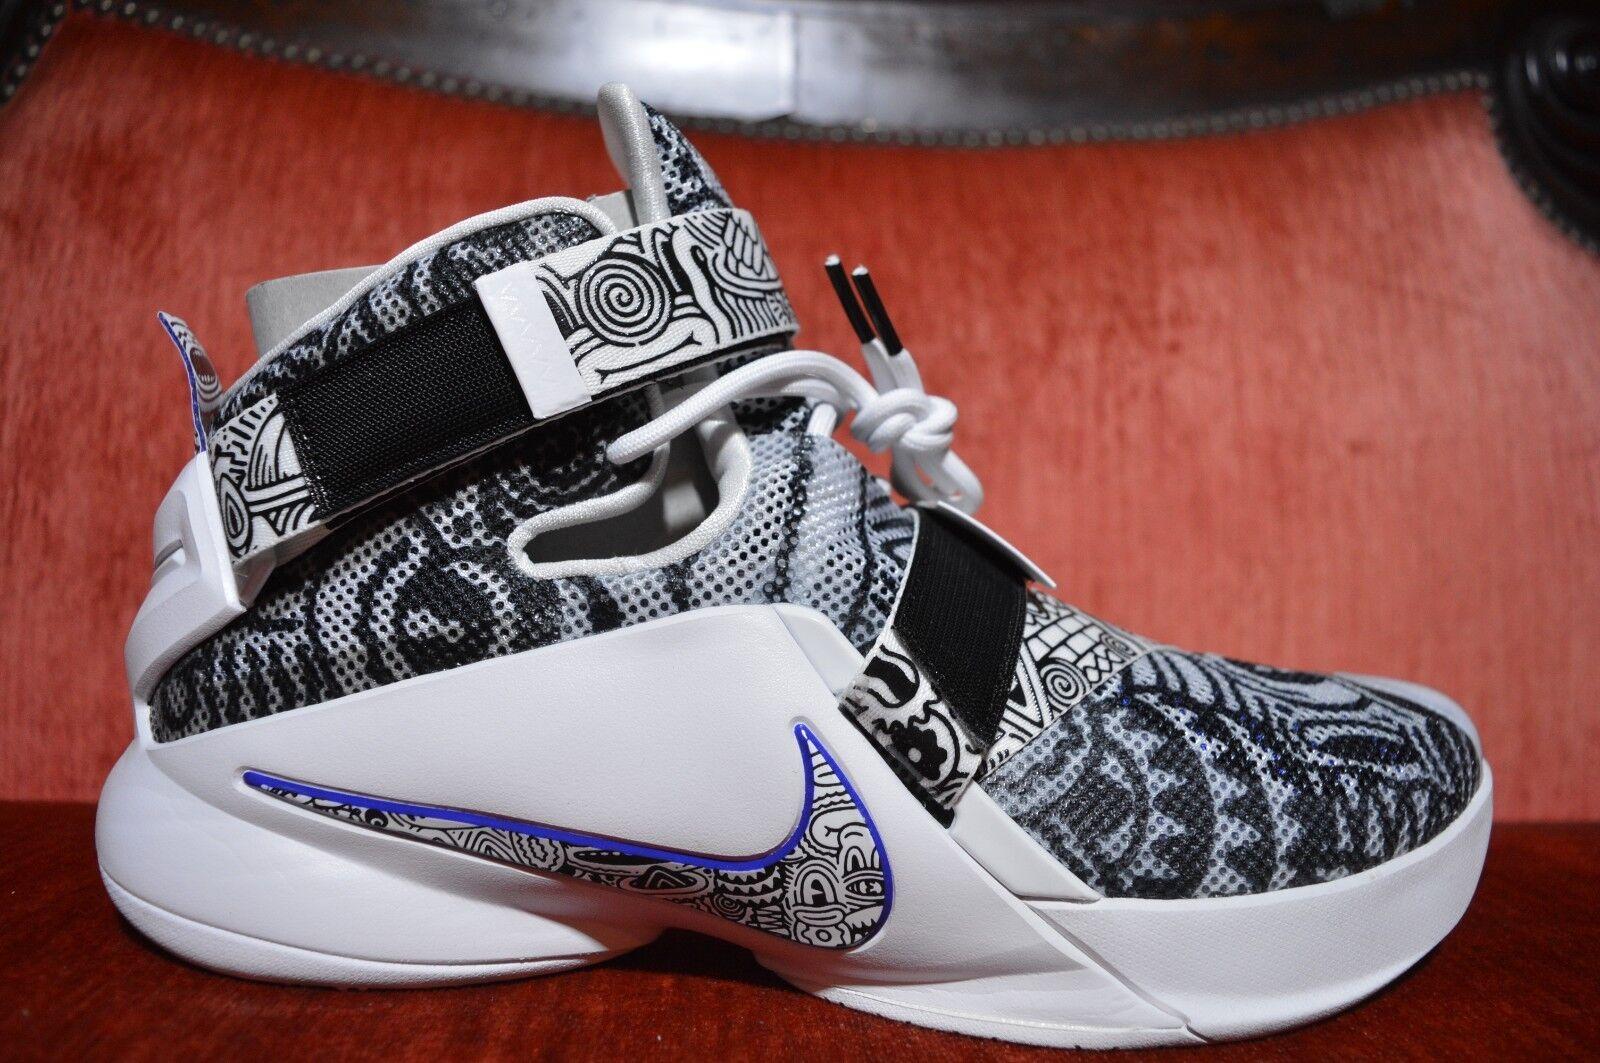 Nike lebron james taglia 12 uomini 810803 014 soldati freegum limted bianco nero